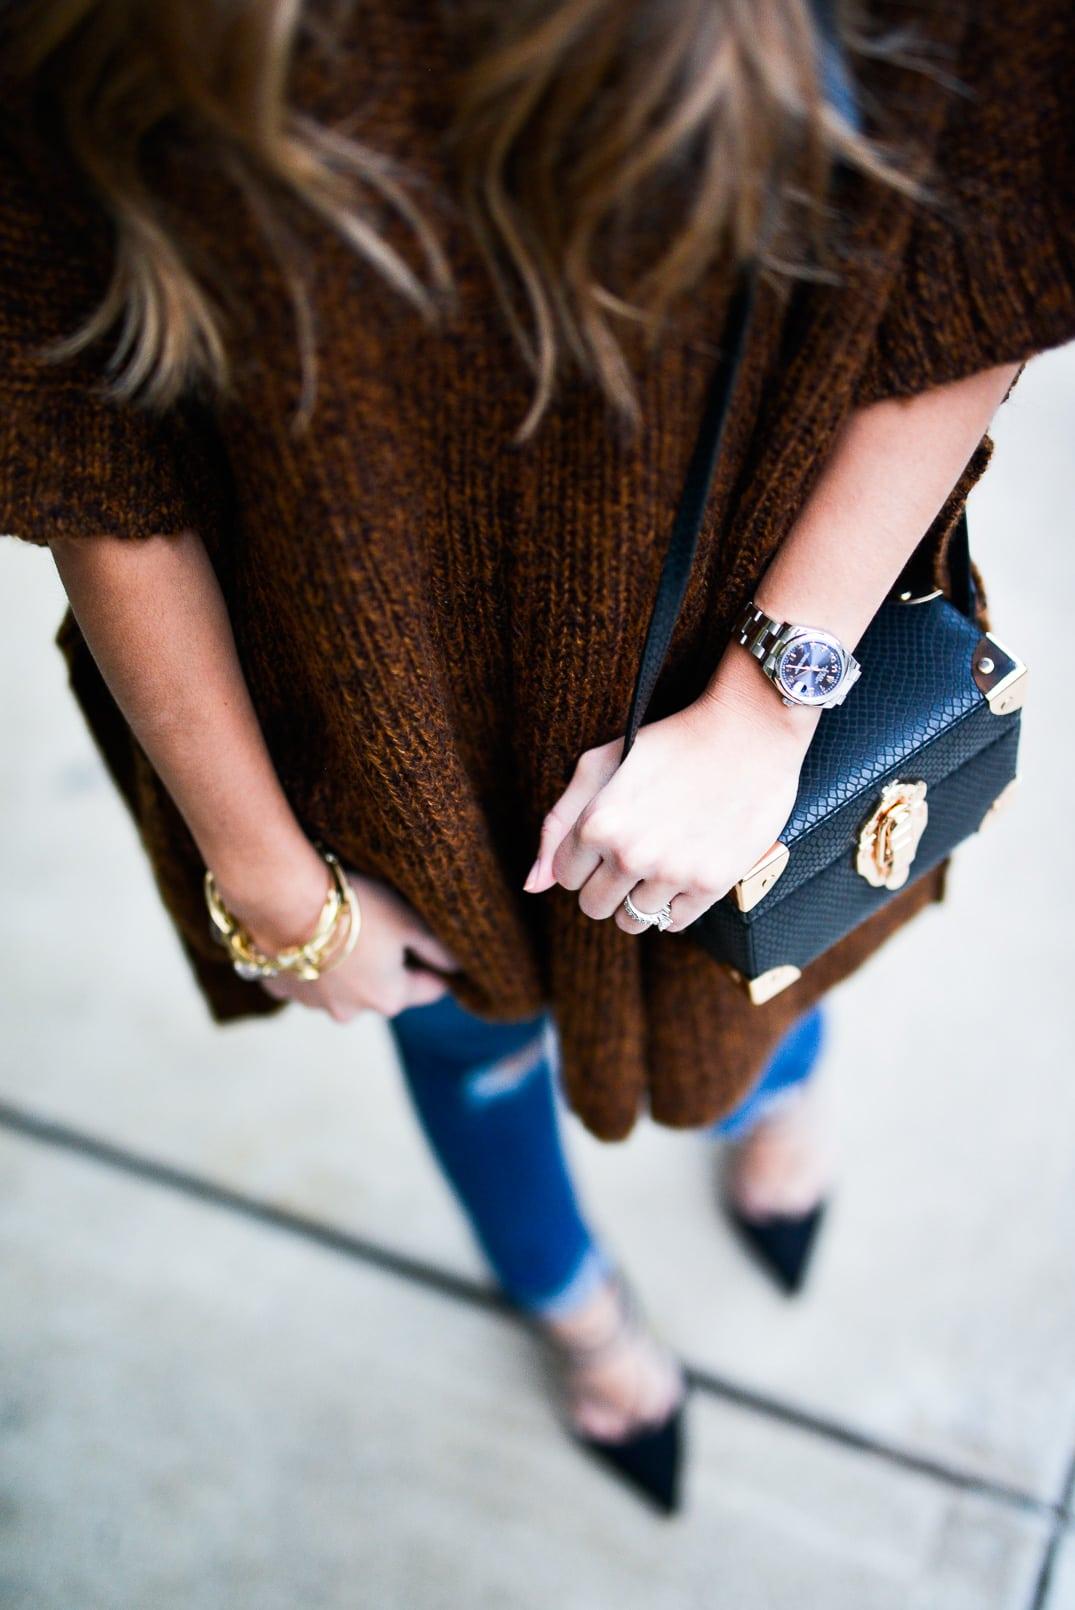 Pam Hetlinger wearing Asos Poncho, Asos Jeans, Asos Lace-up heels, Reiss bucket bag